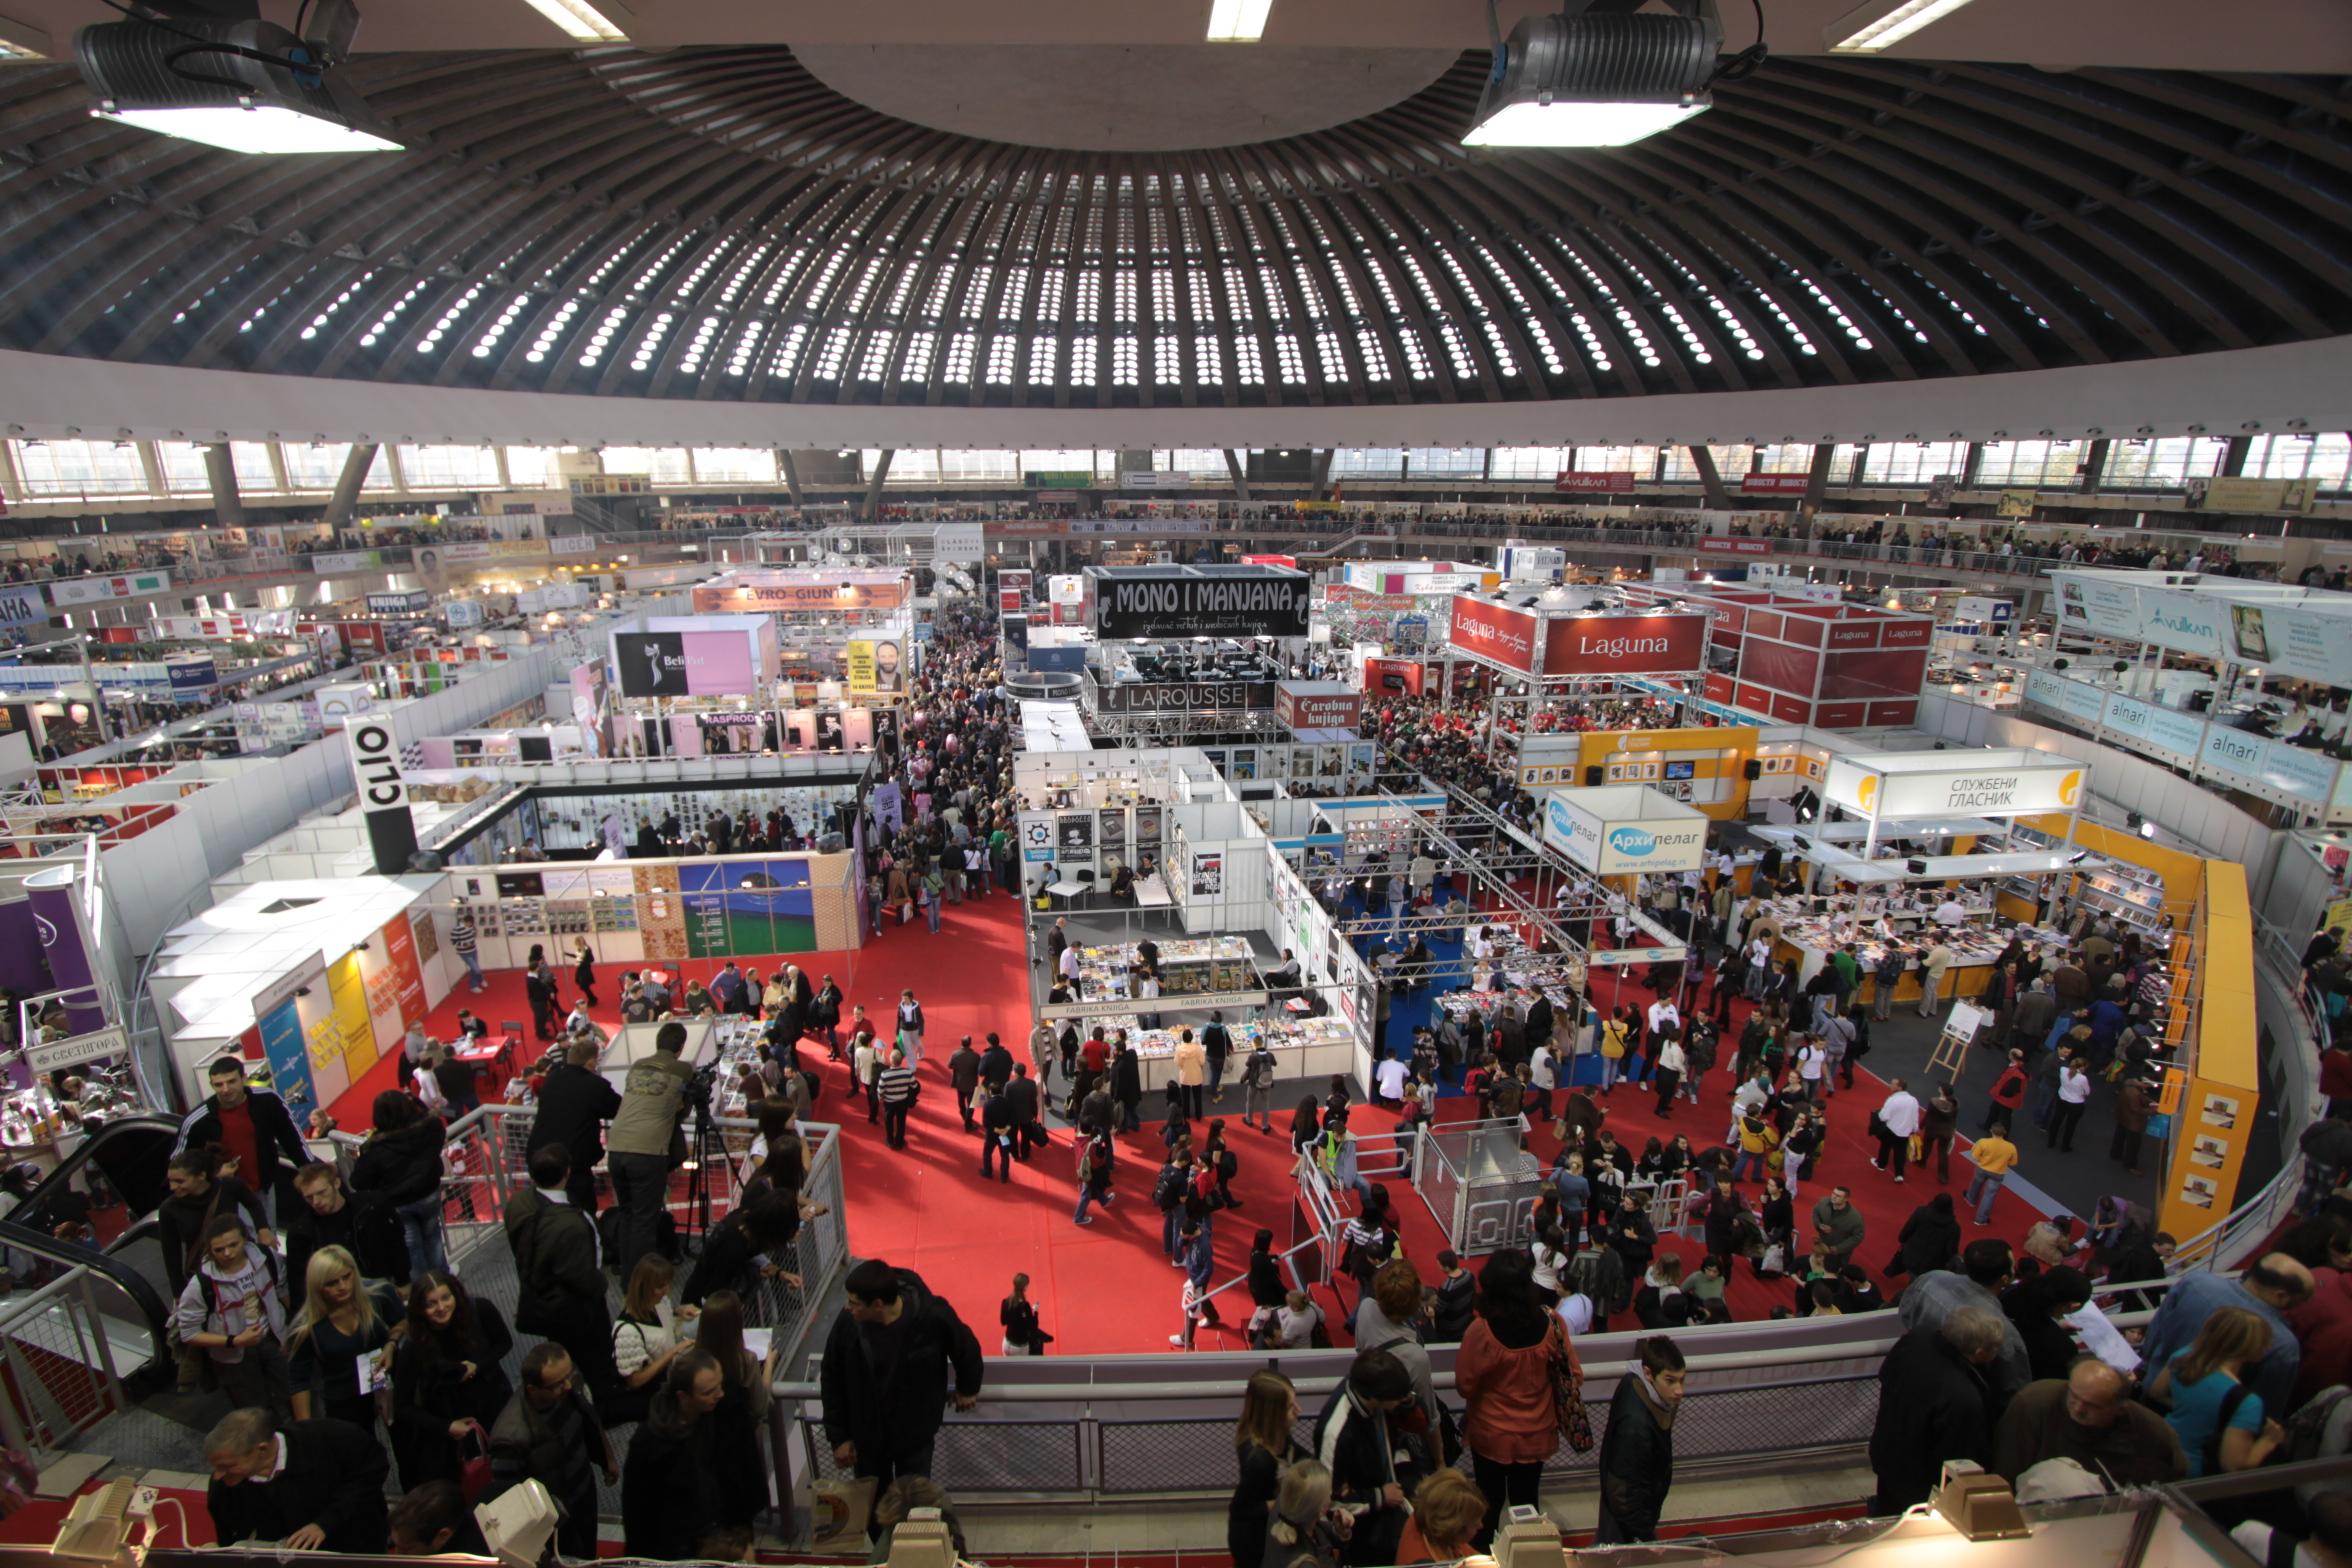 Beograd dočekuje pisce iz celog sveta – počinje Sajam knjiga